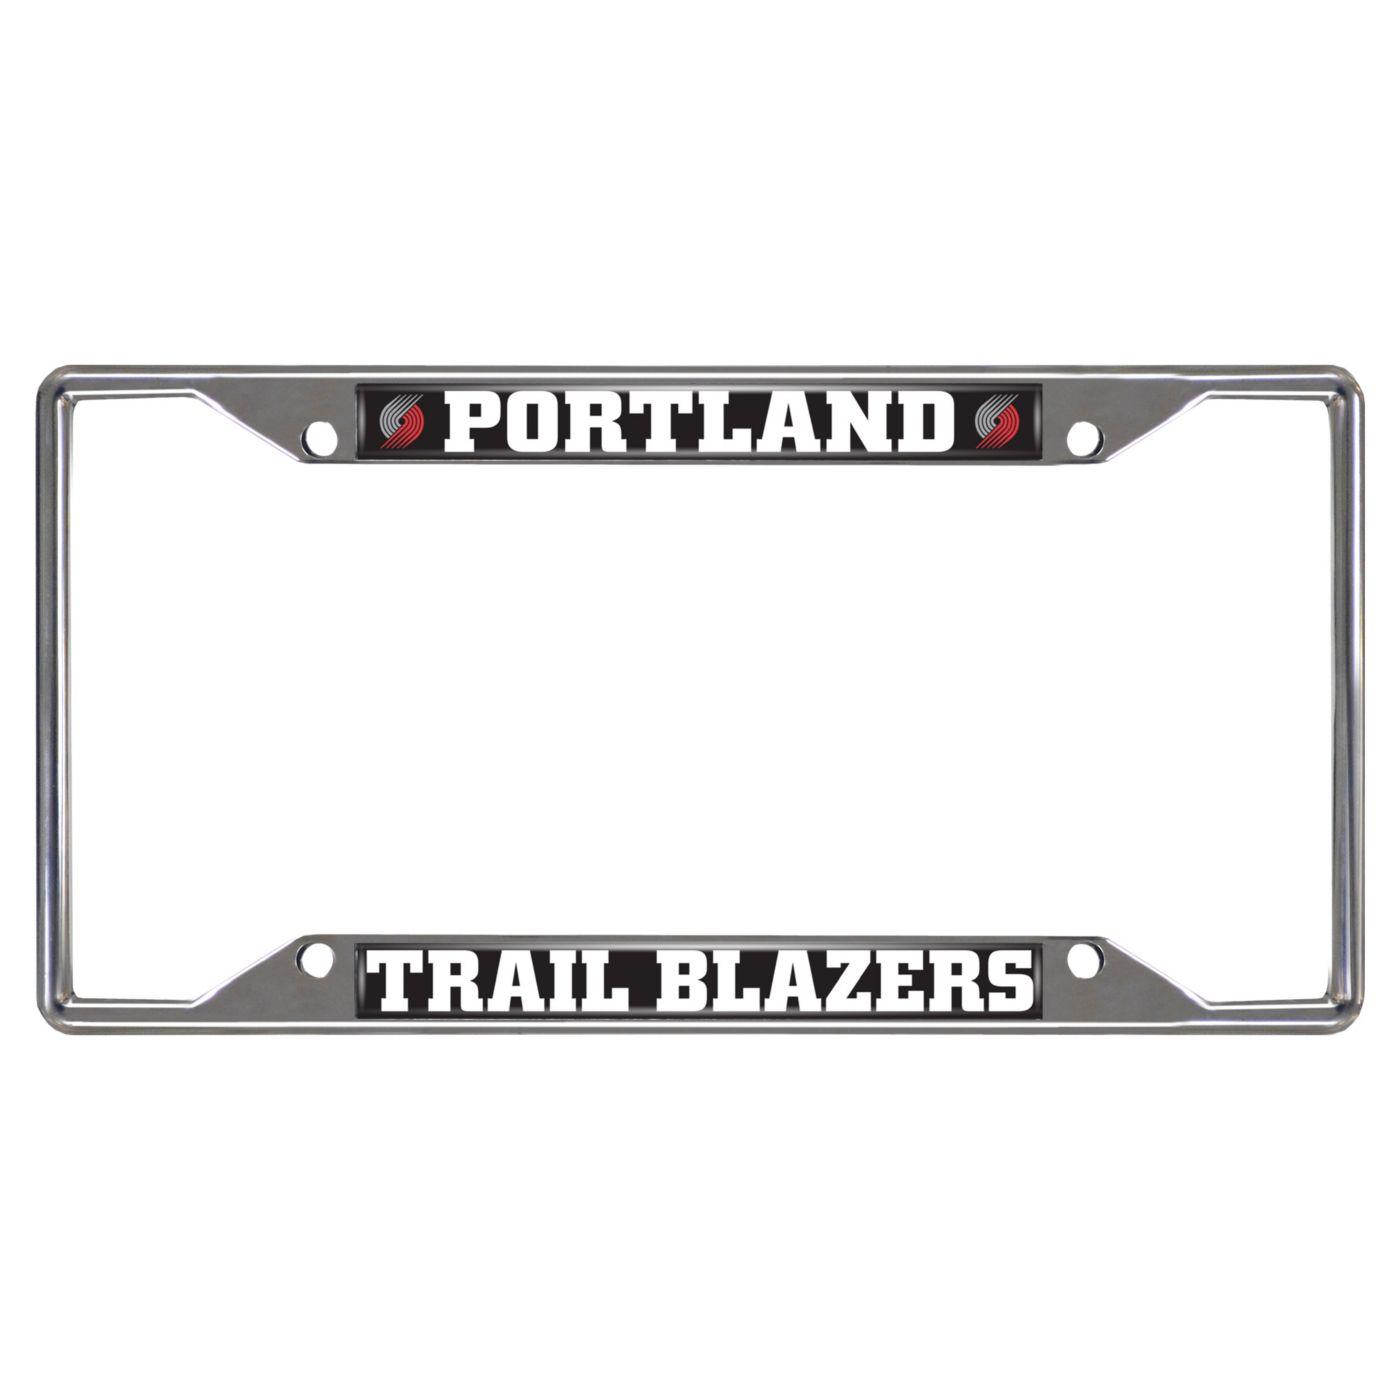 FANMATS Portland Trail Blazers License Plate Frame